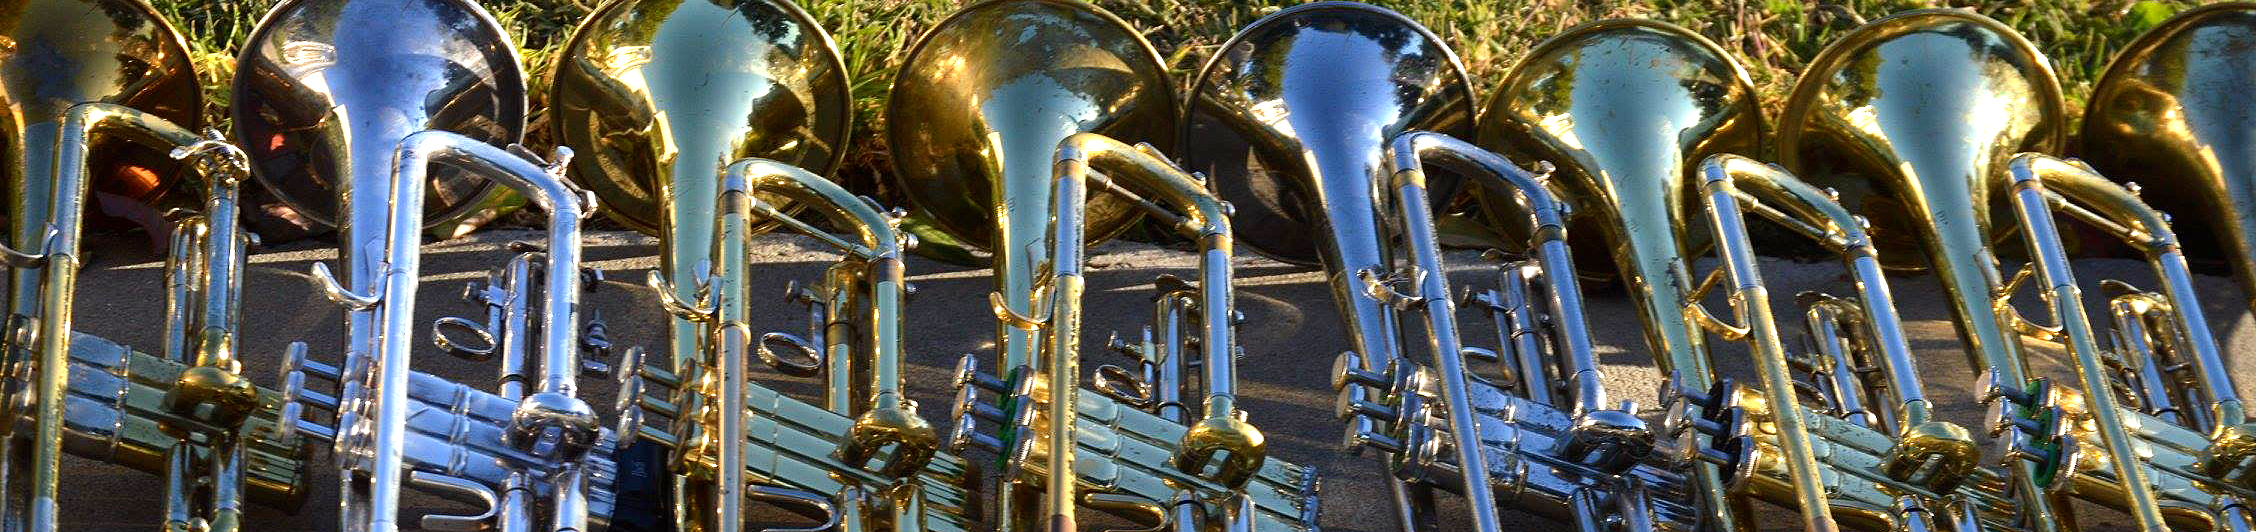 Trumpets2_Banner_2016